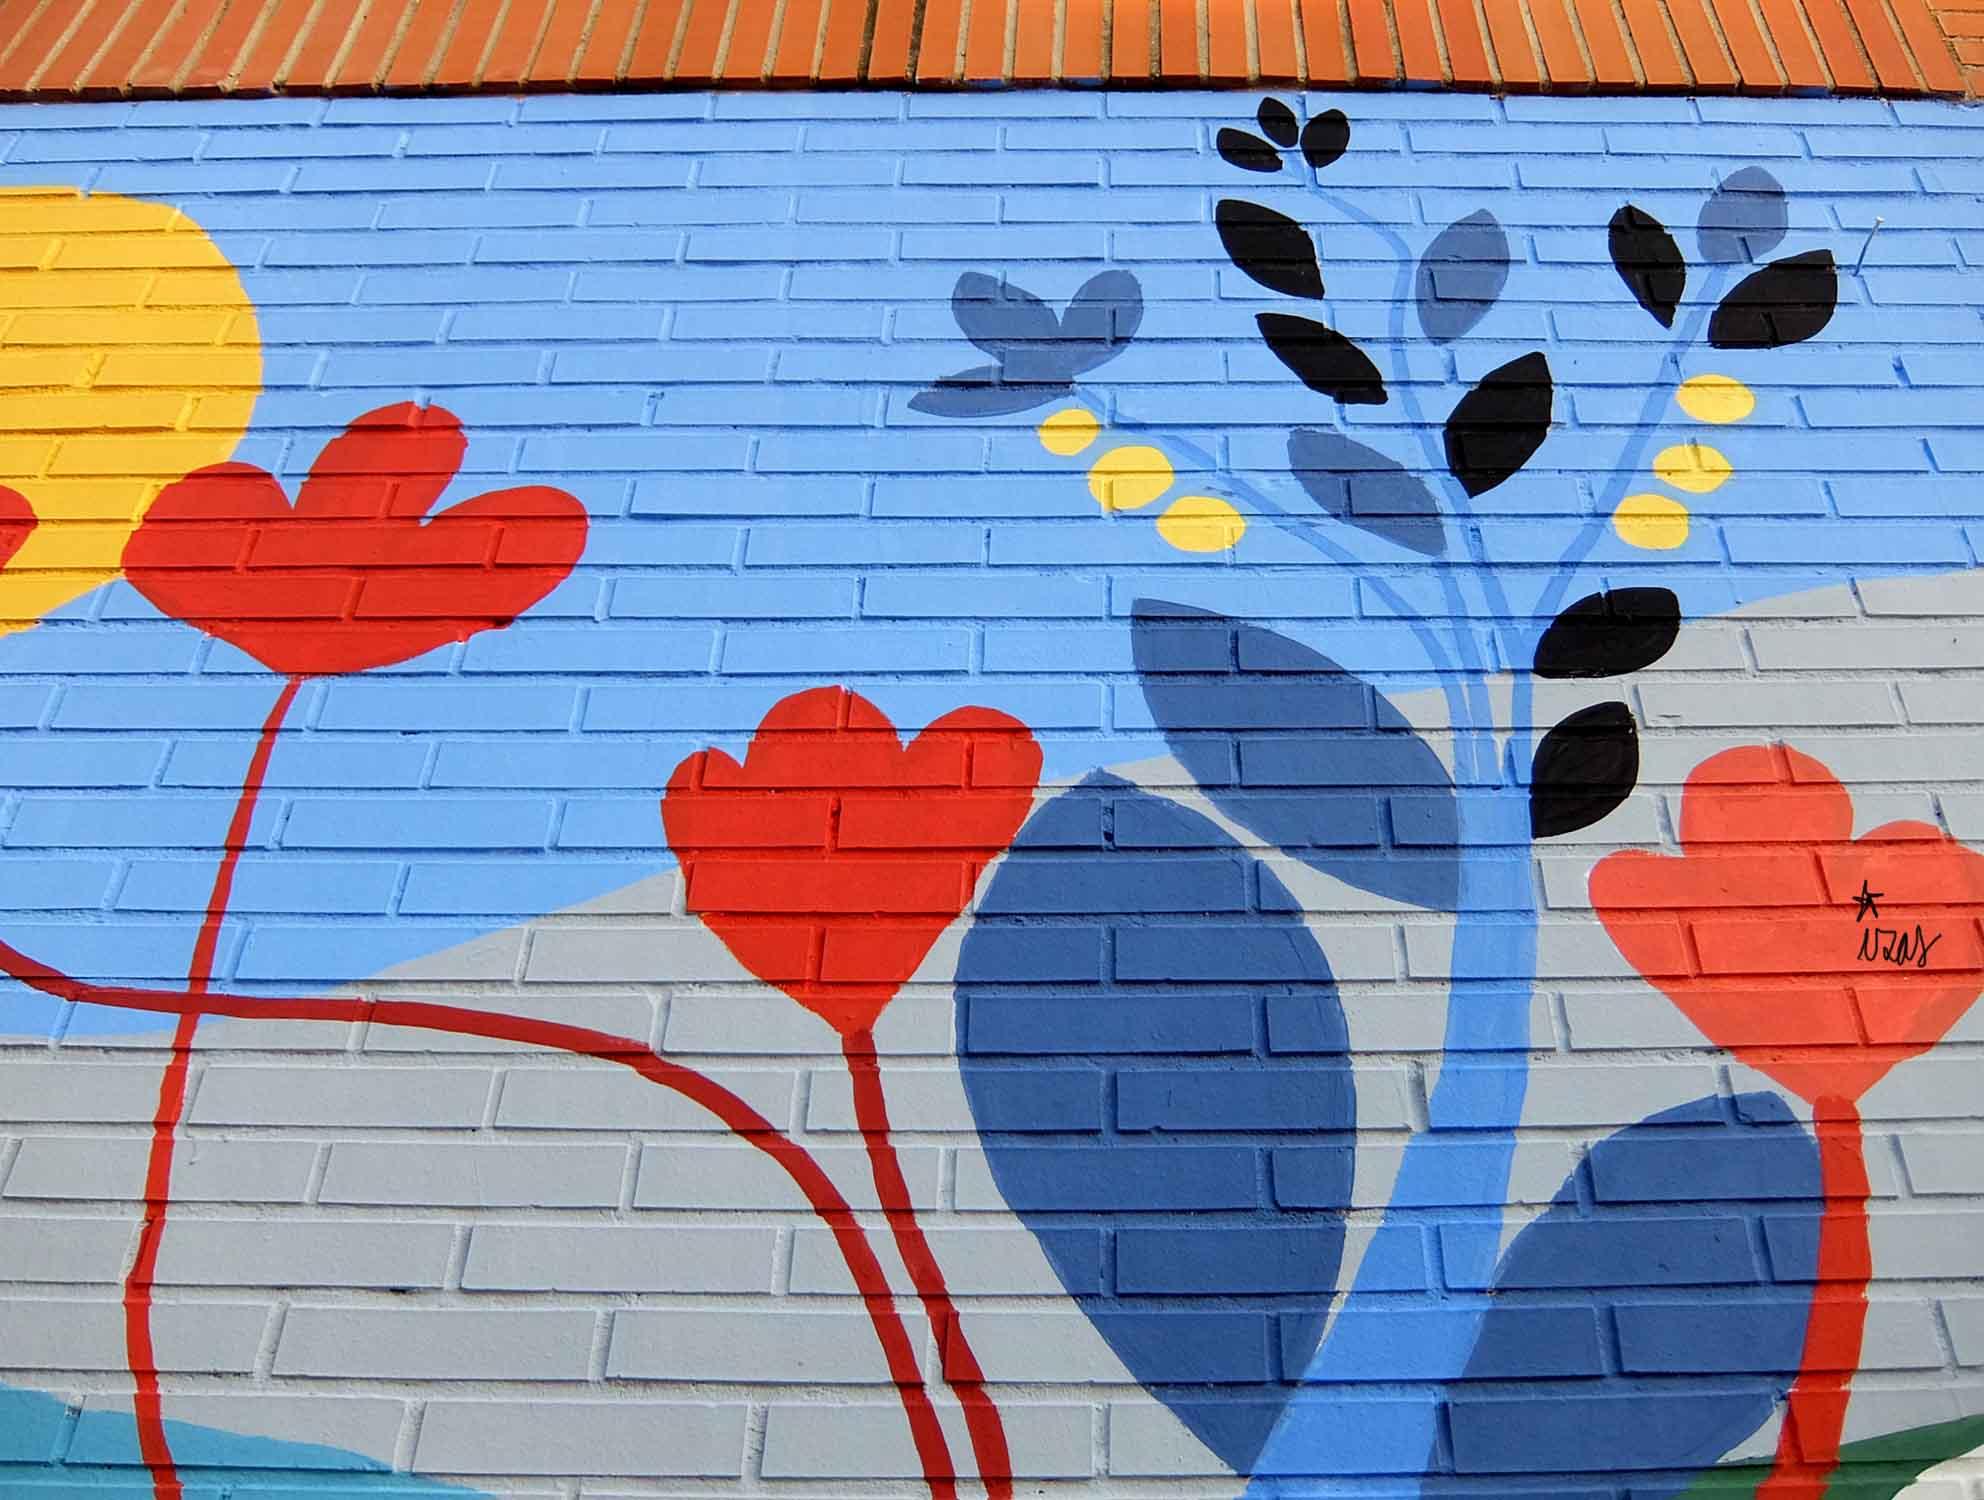 mural izas pinar prados infantil 5